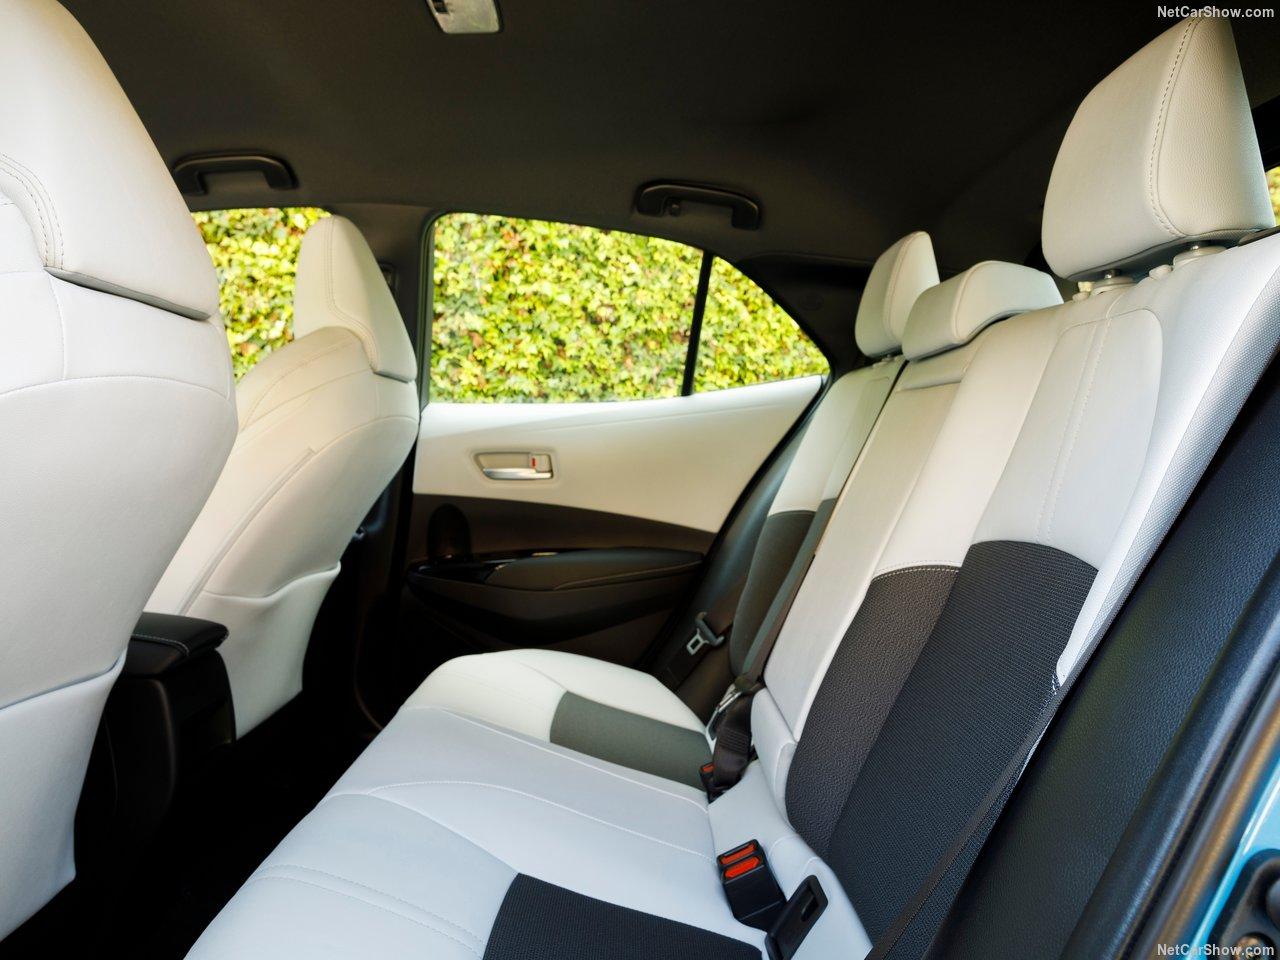 Toyota-Corolla_Hatchback-2019-1280-37.jpg